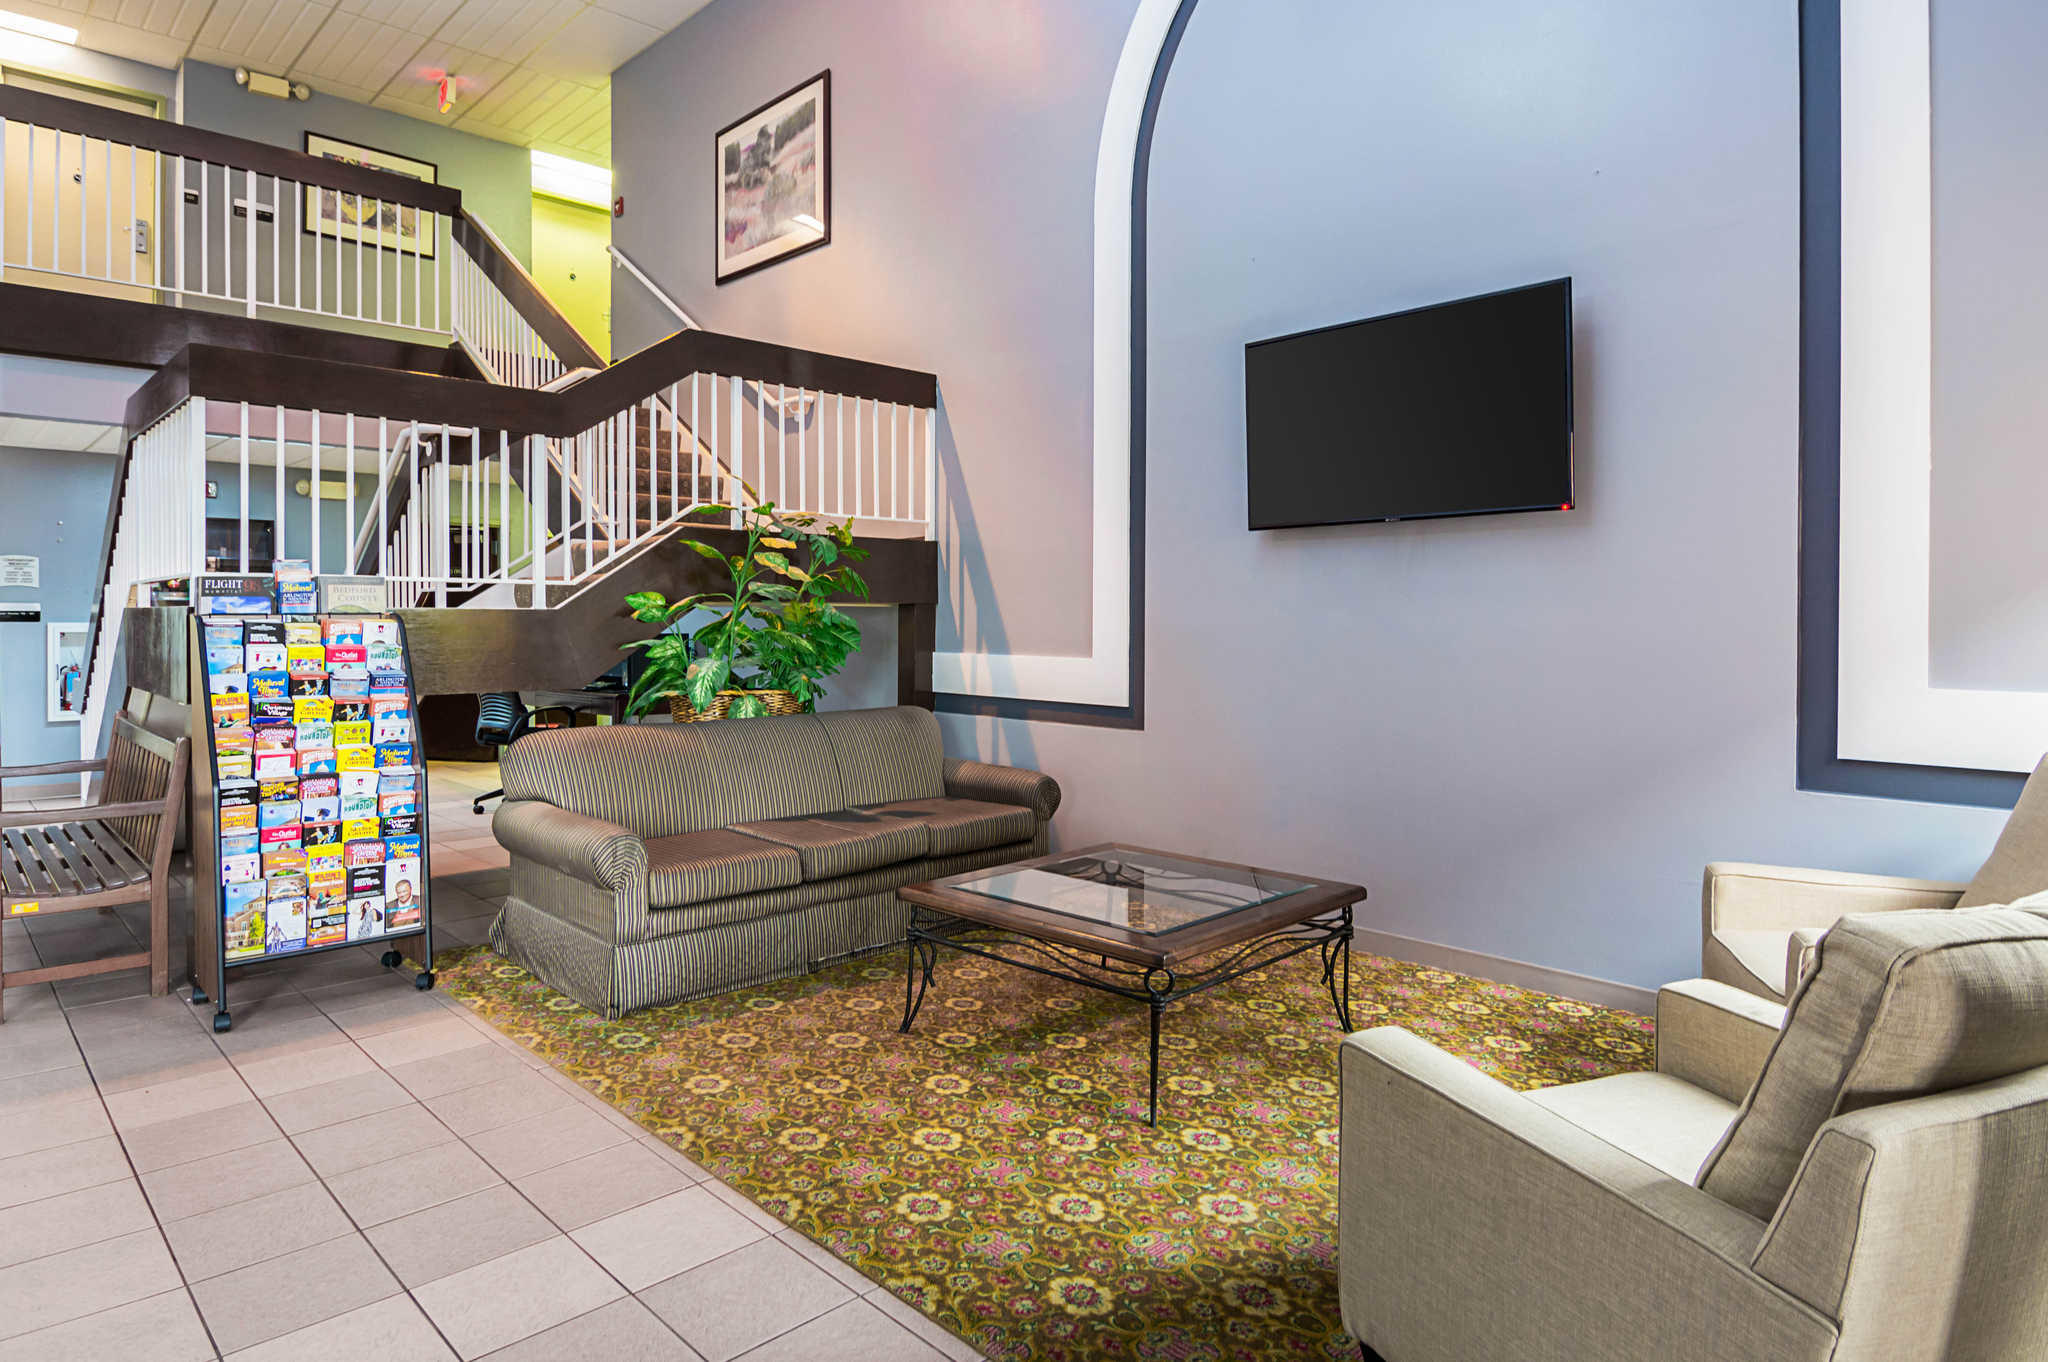 Quality Inn & Suites Kearneysville - Martinsburg image 5